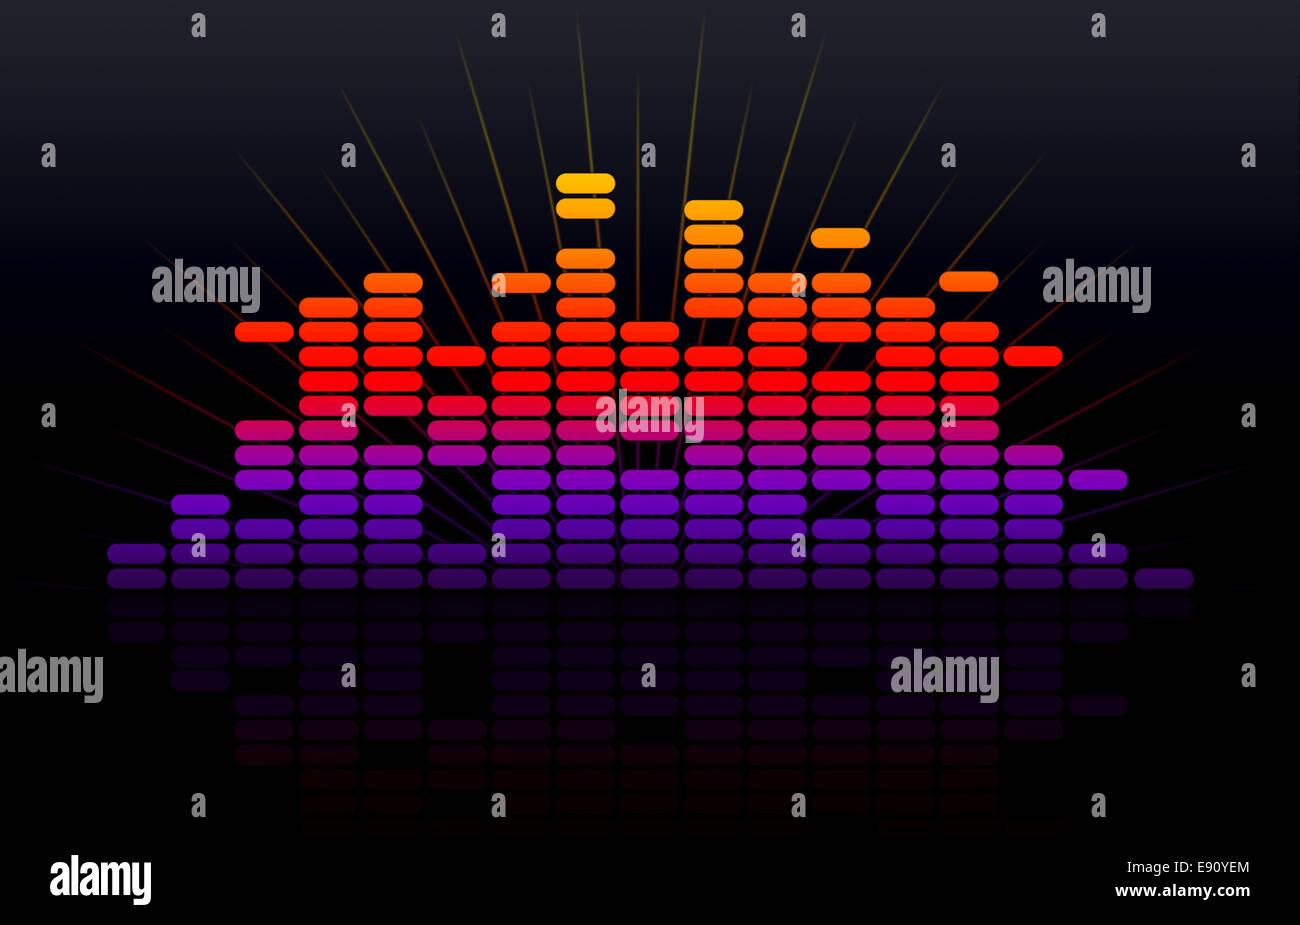 Digital music equalizer Stock Photo: 74394956 - Alamy